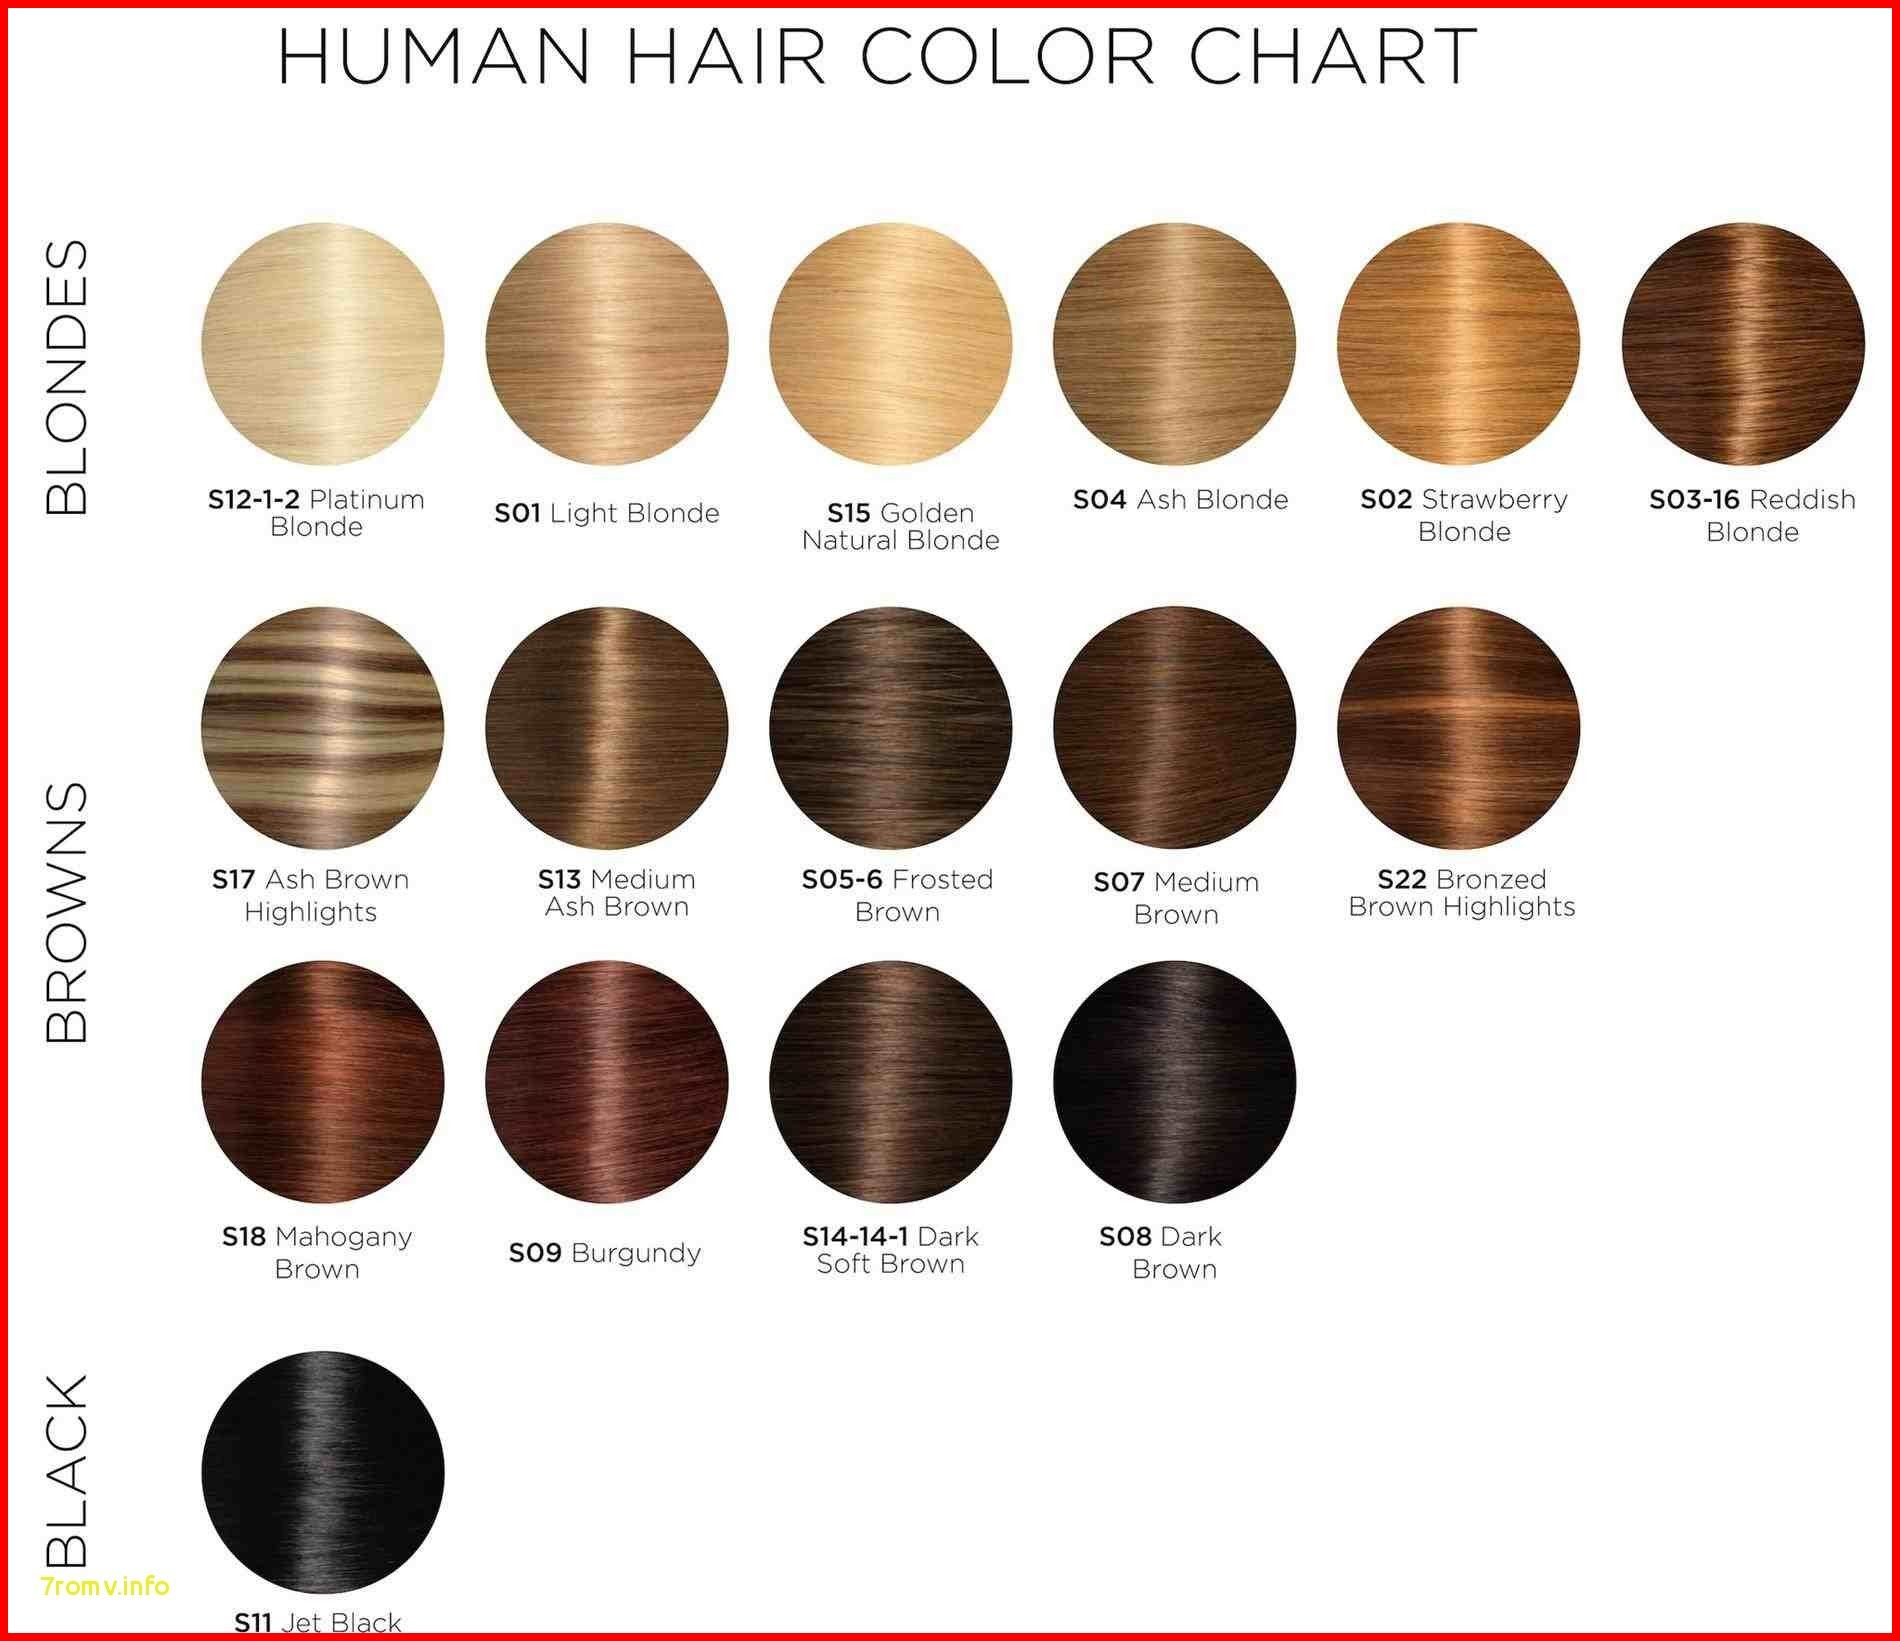 Majirel Hair Color Chart 149415 Hair Colour Chart Loreal Majirel Elegant Schwarzkopf Hair Dye Color Hair Color Chart Human Hair Hair Color